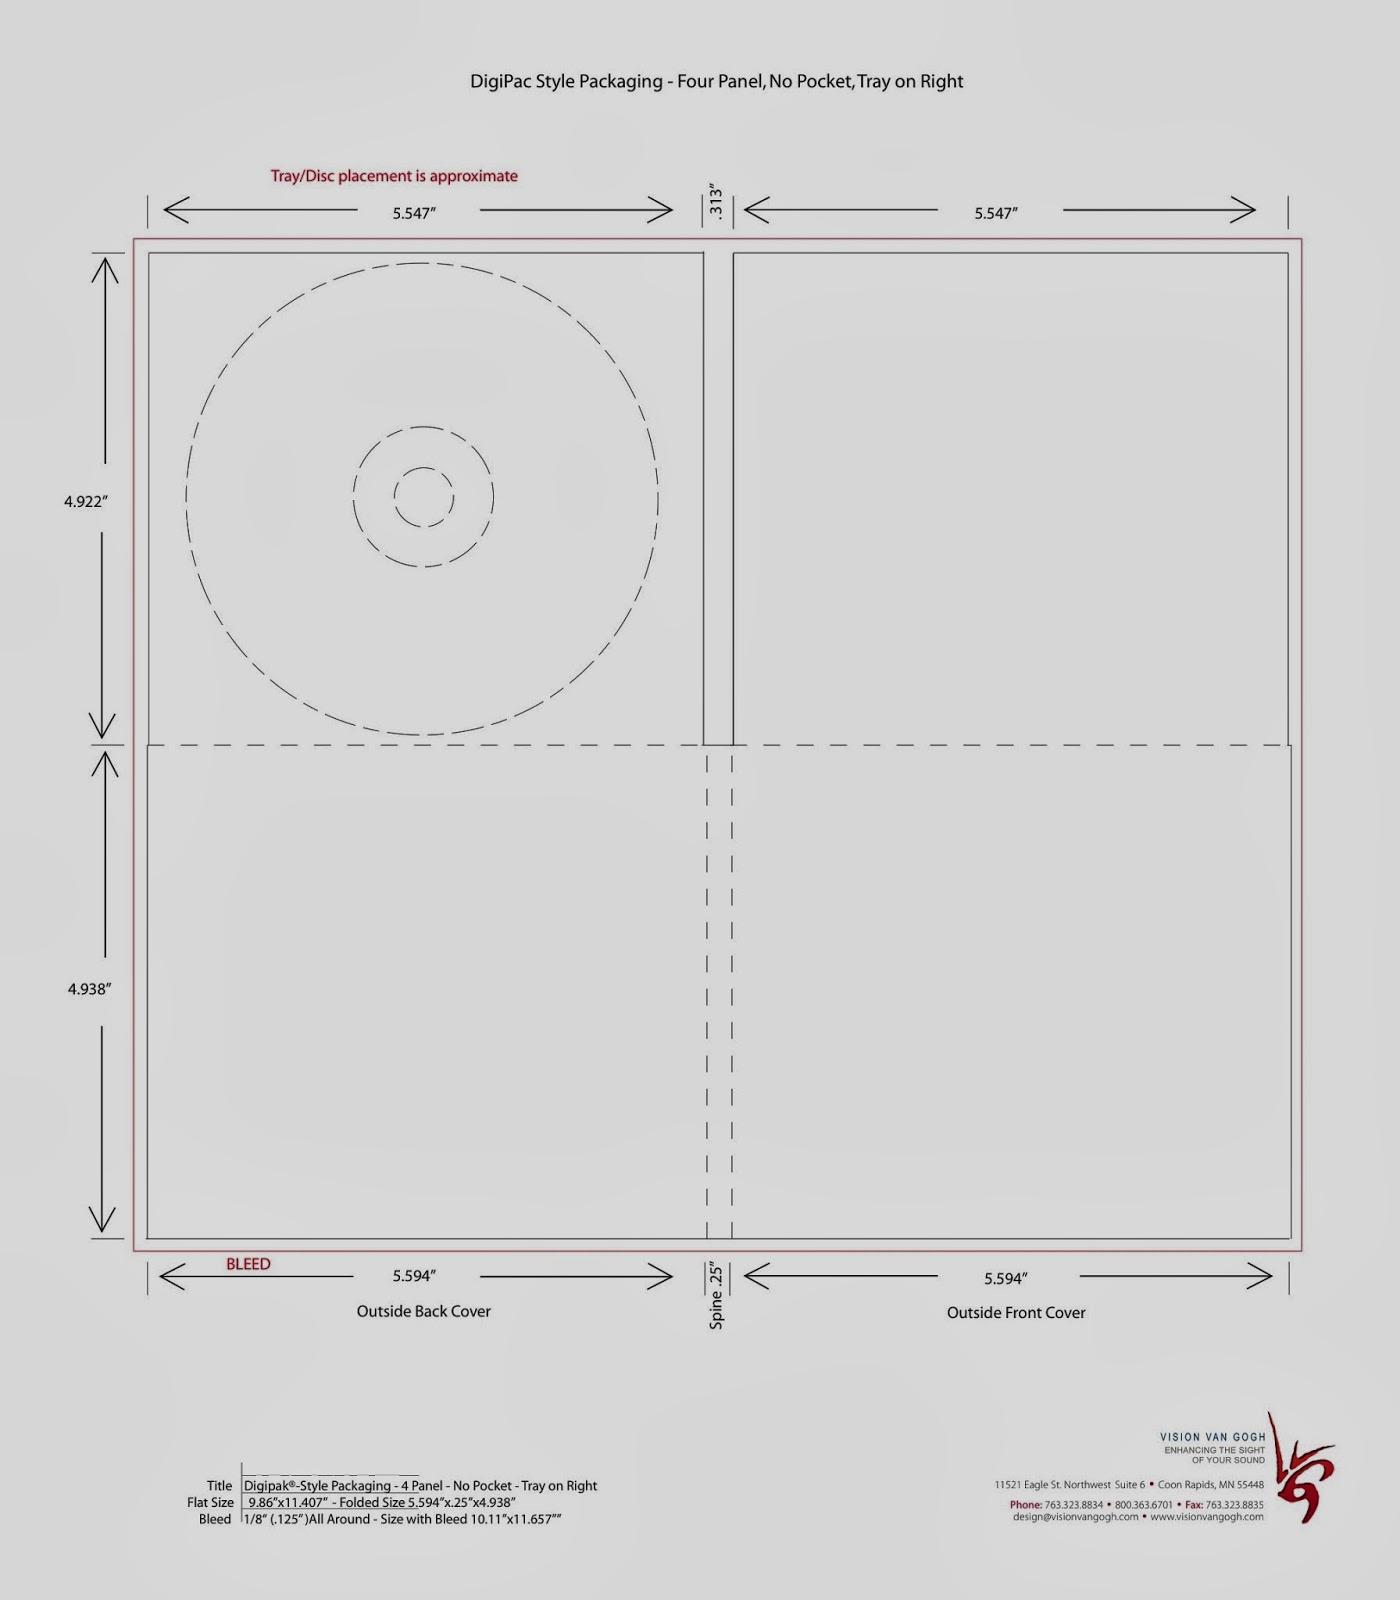 liam northwood a2 media my digipak template. Black Bedroom Furniture Sets. Home Design Ideas